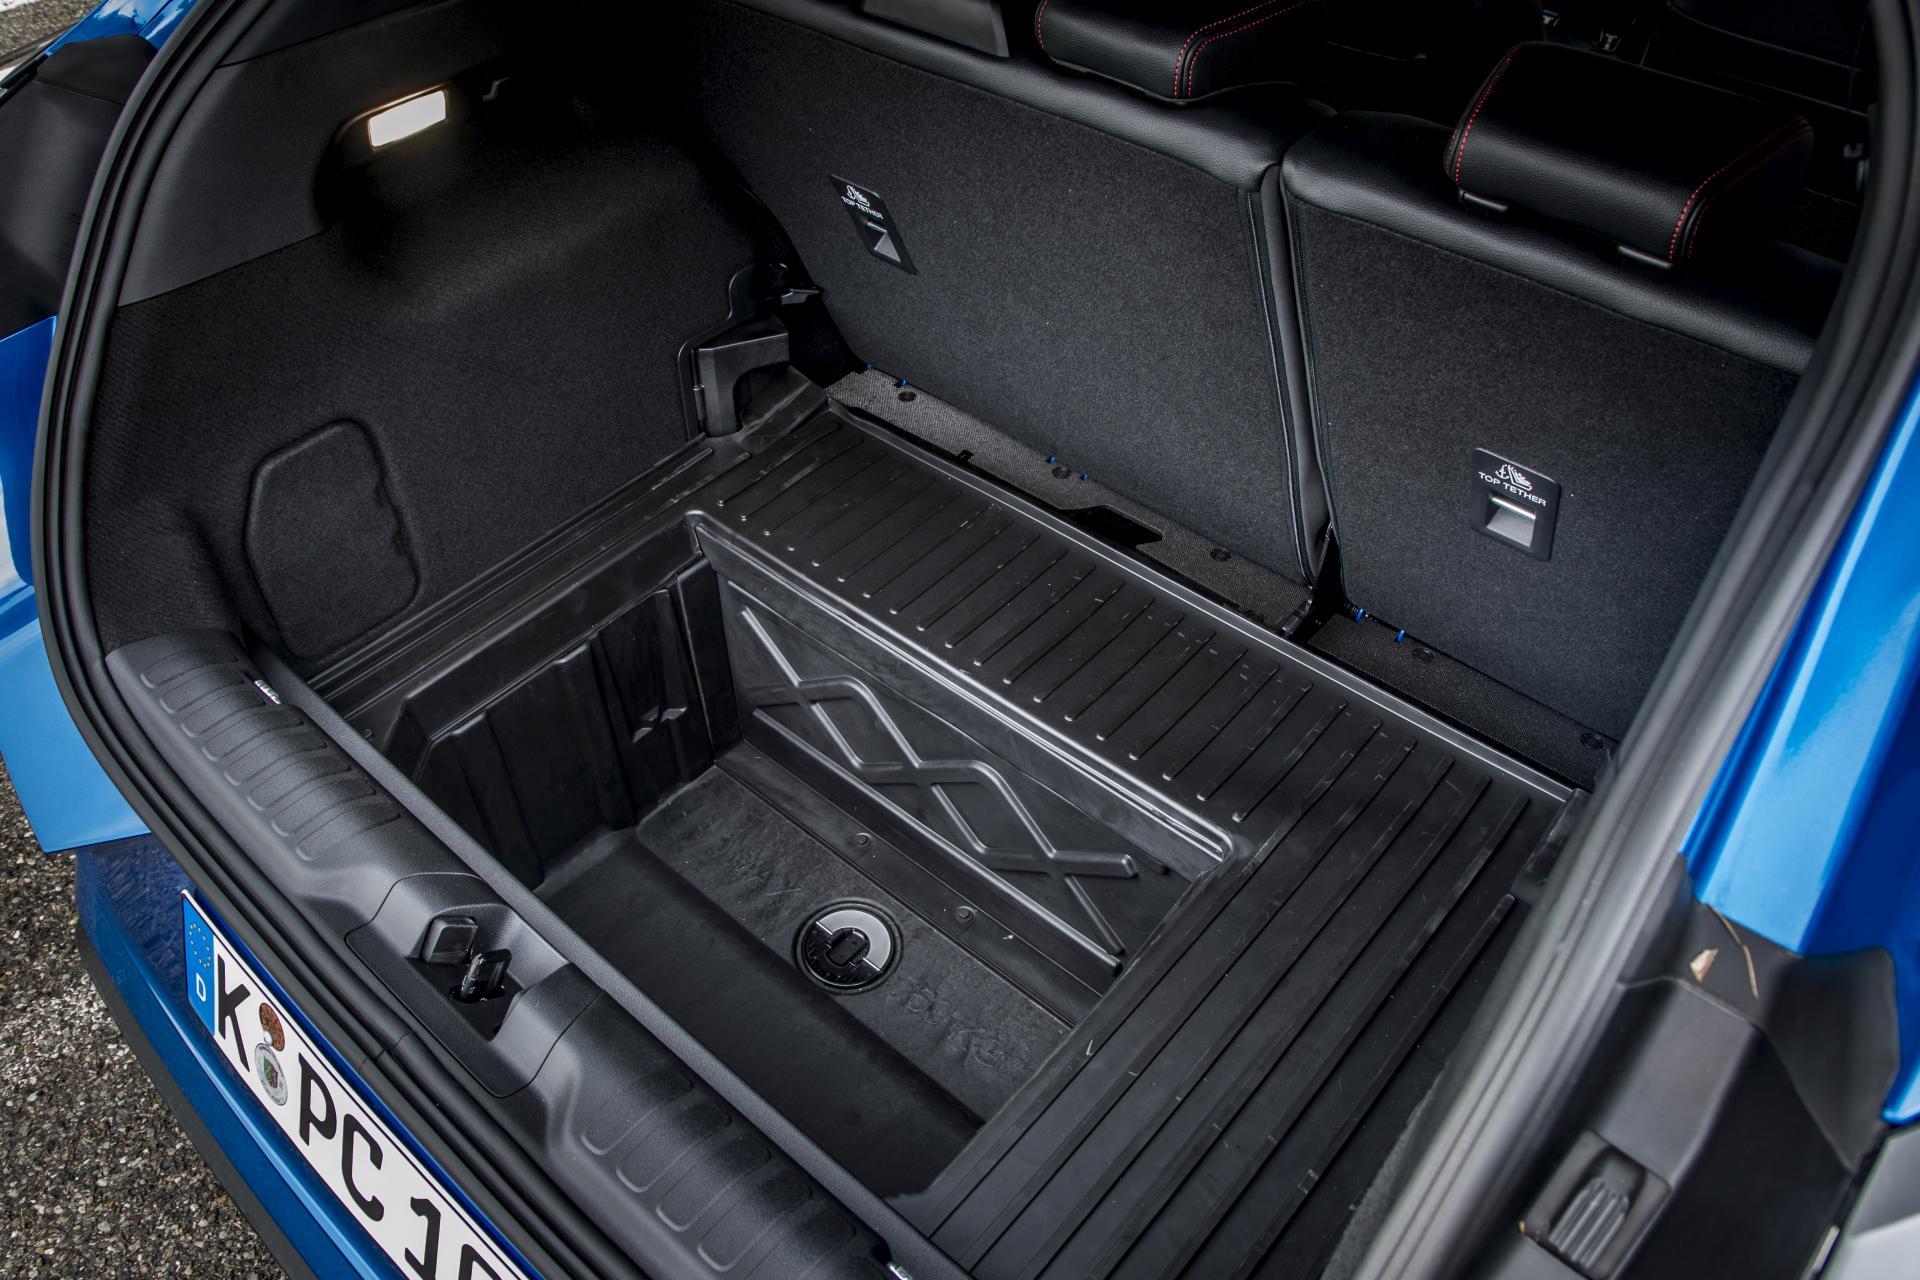 Ford Puma 1.0 EcoBoost Hybrid Mega Box